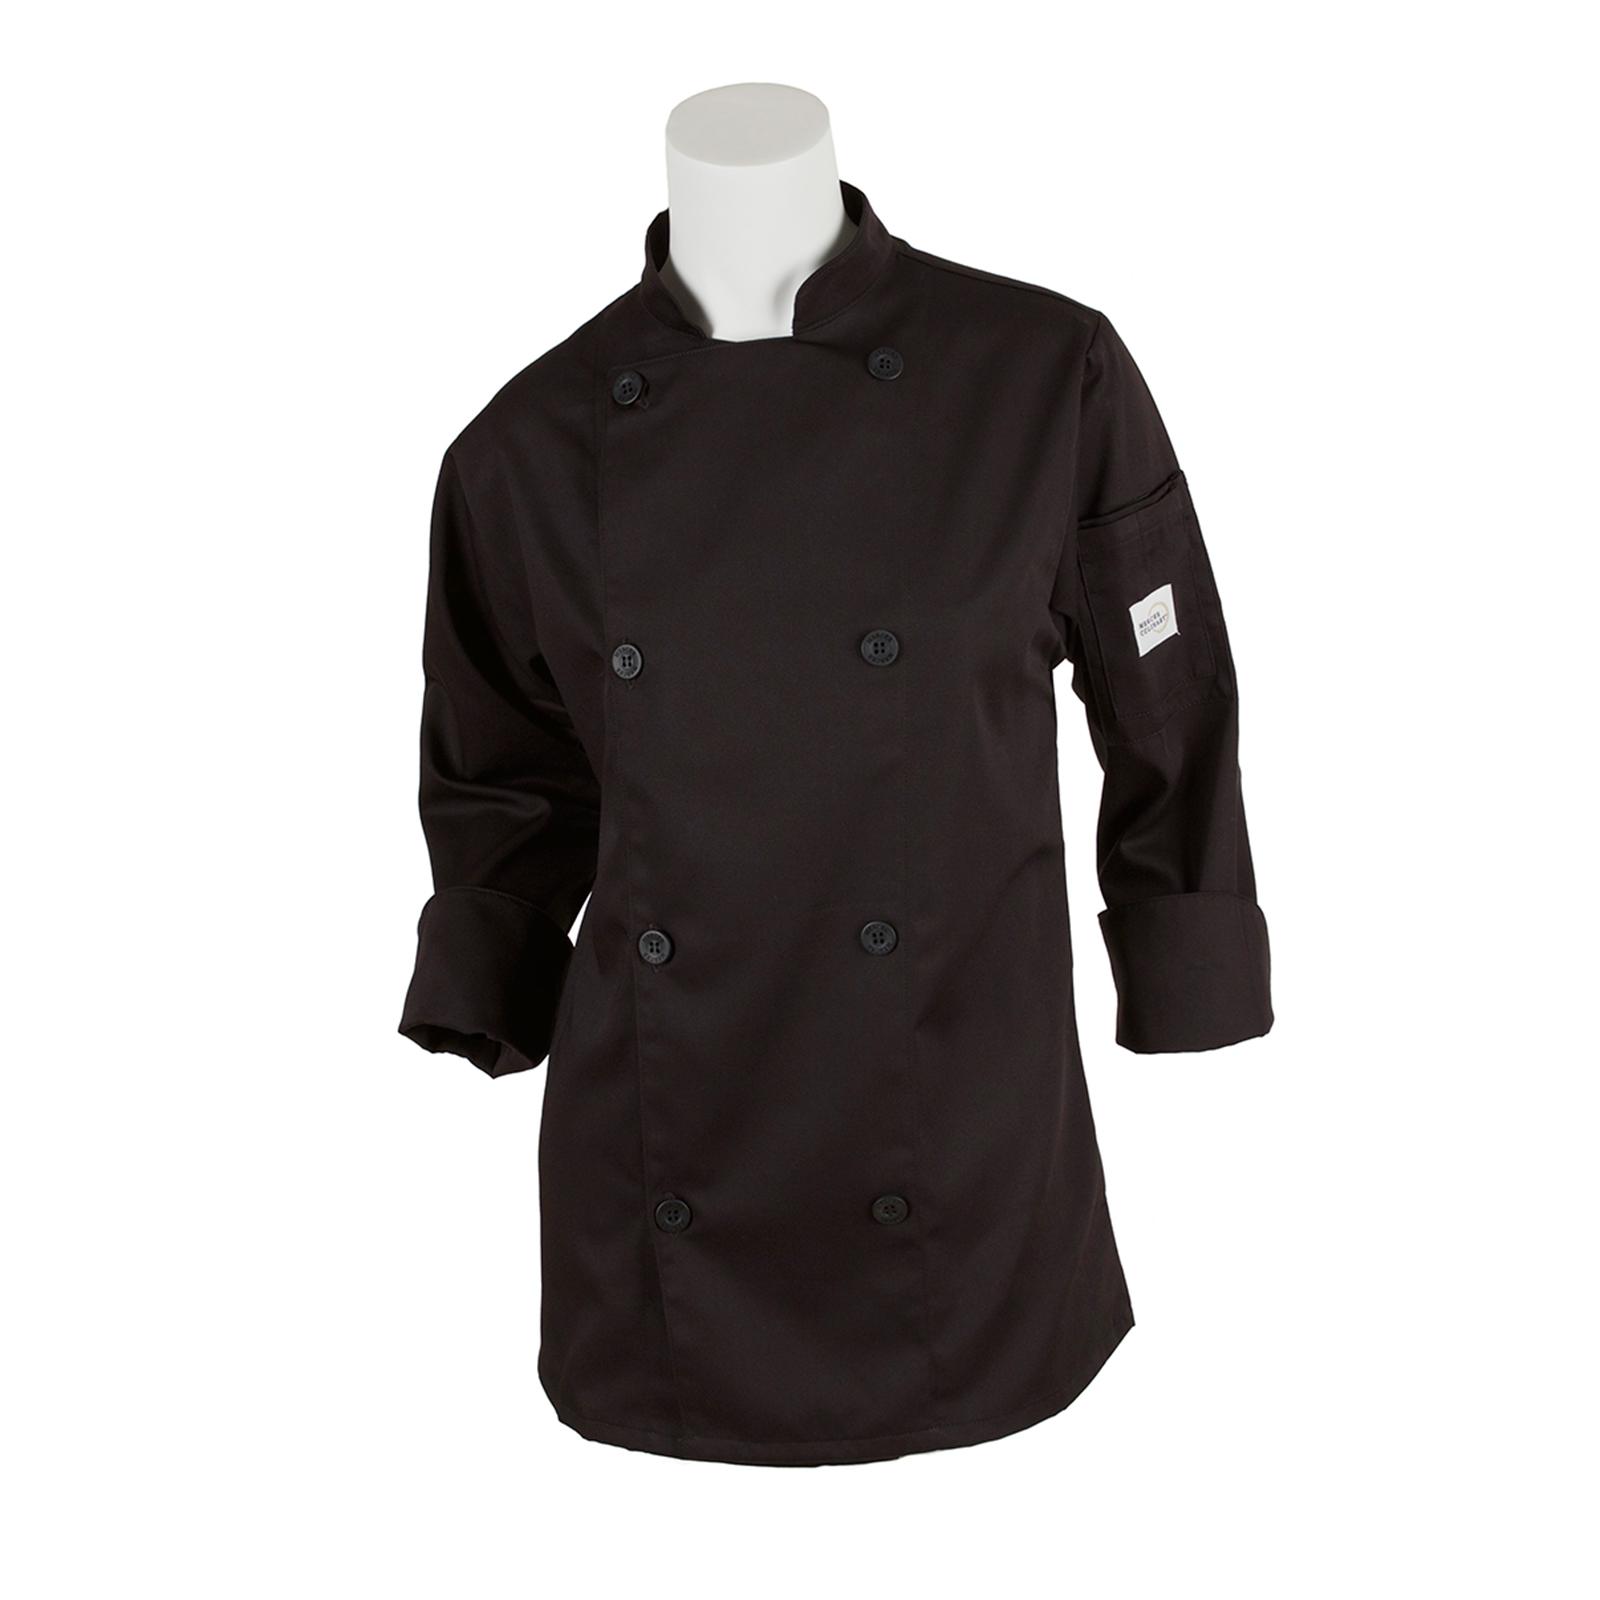 Mercer Culinary M61030BKXXS chef's coat